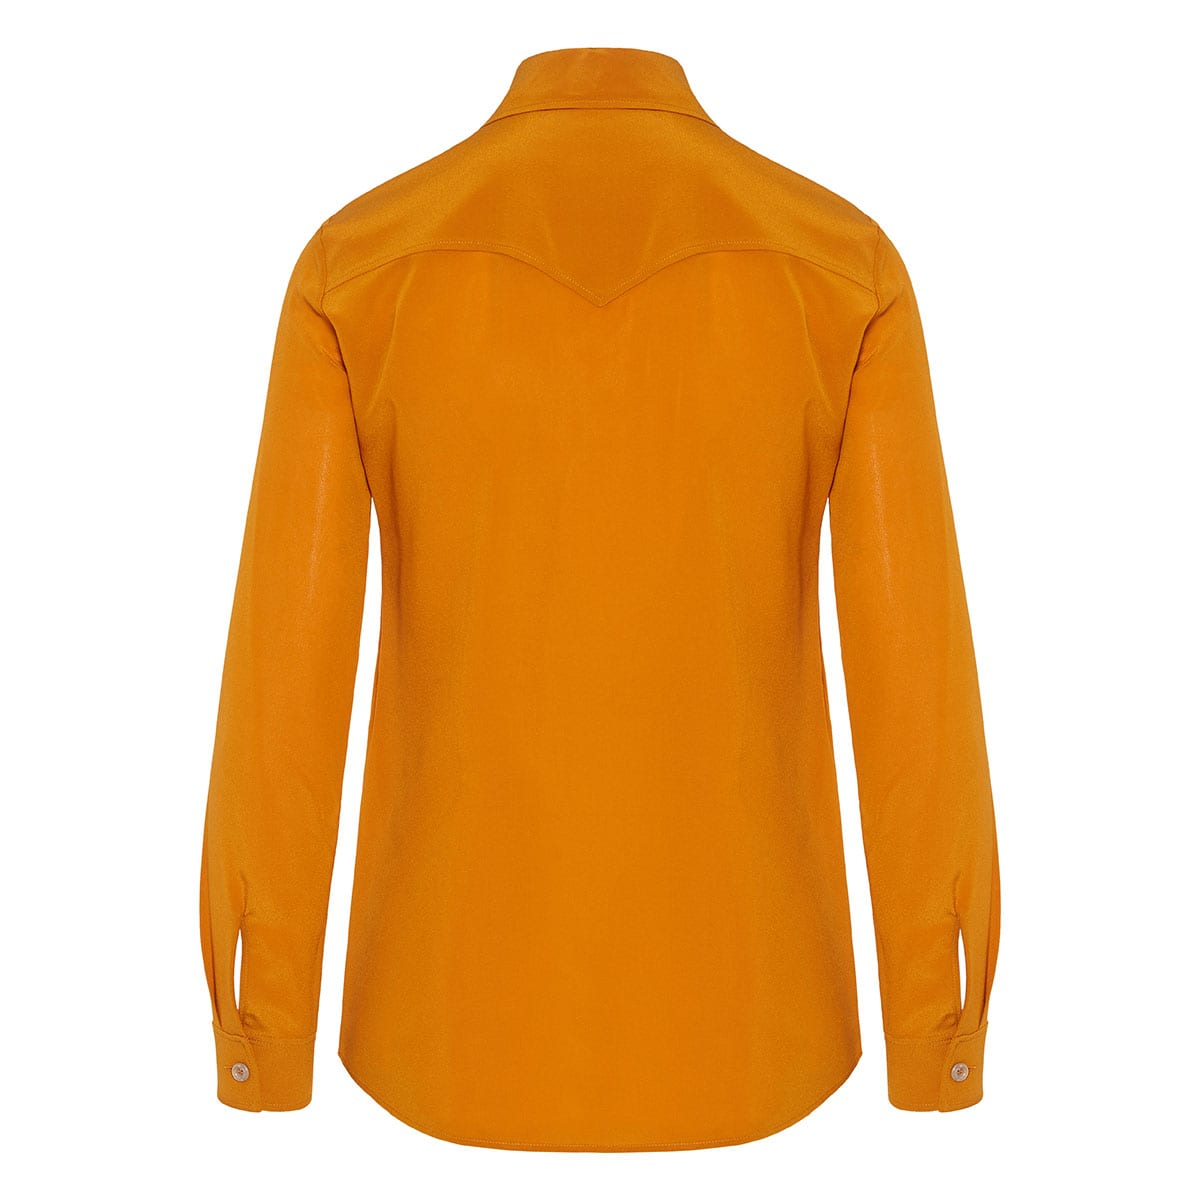 Pointed-collar silk shirt